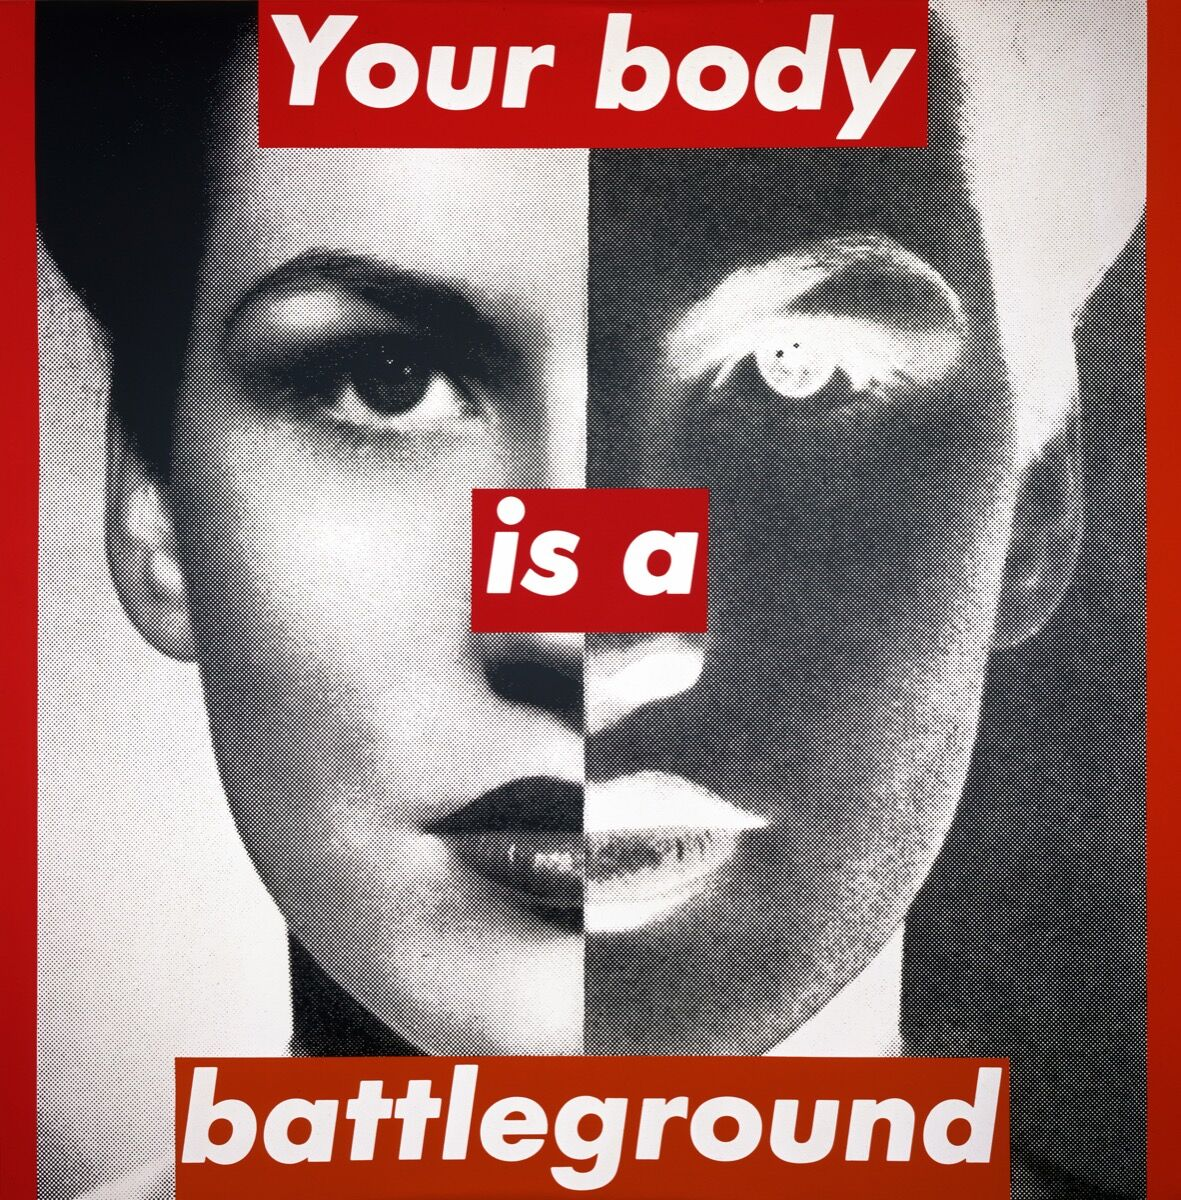 b19610d25b57 Barbara Kruger, Untitled (Your body is a battleground) , 1989. © Barbara